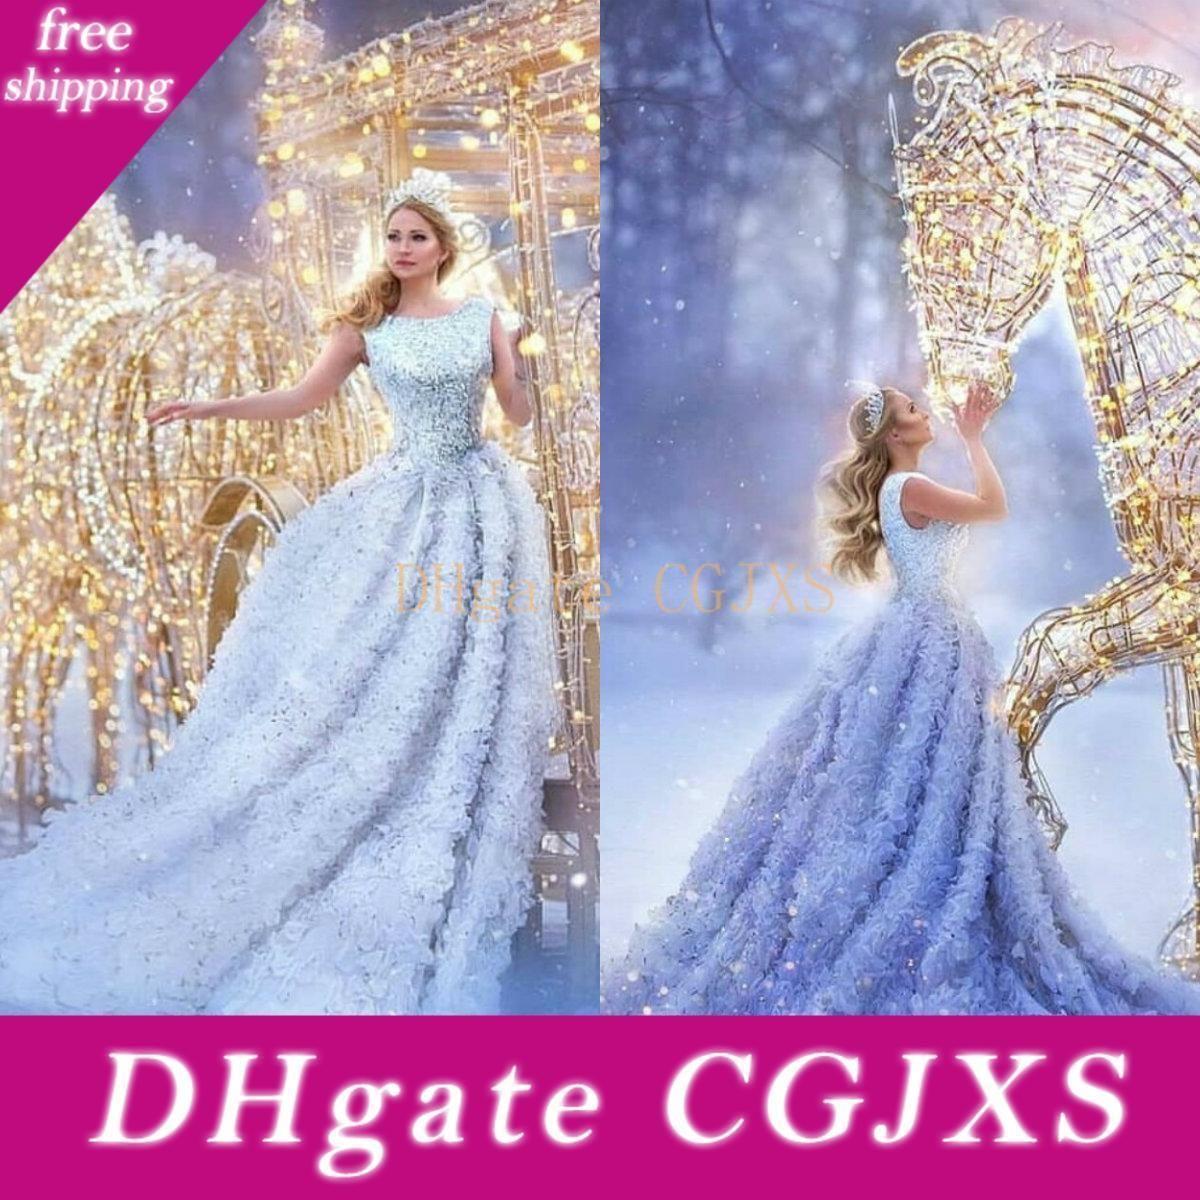 2020 luxe robes de soirée Jewel manches dentelle perlée Paillettes Party Robes Custom Made Sweep Trian longue Occasion spéciale Robe